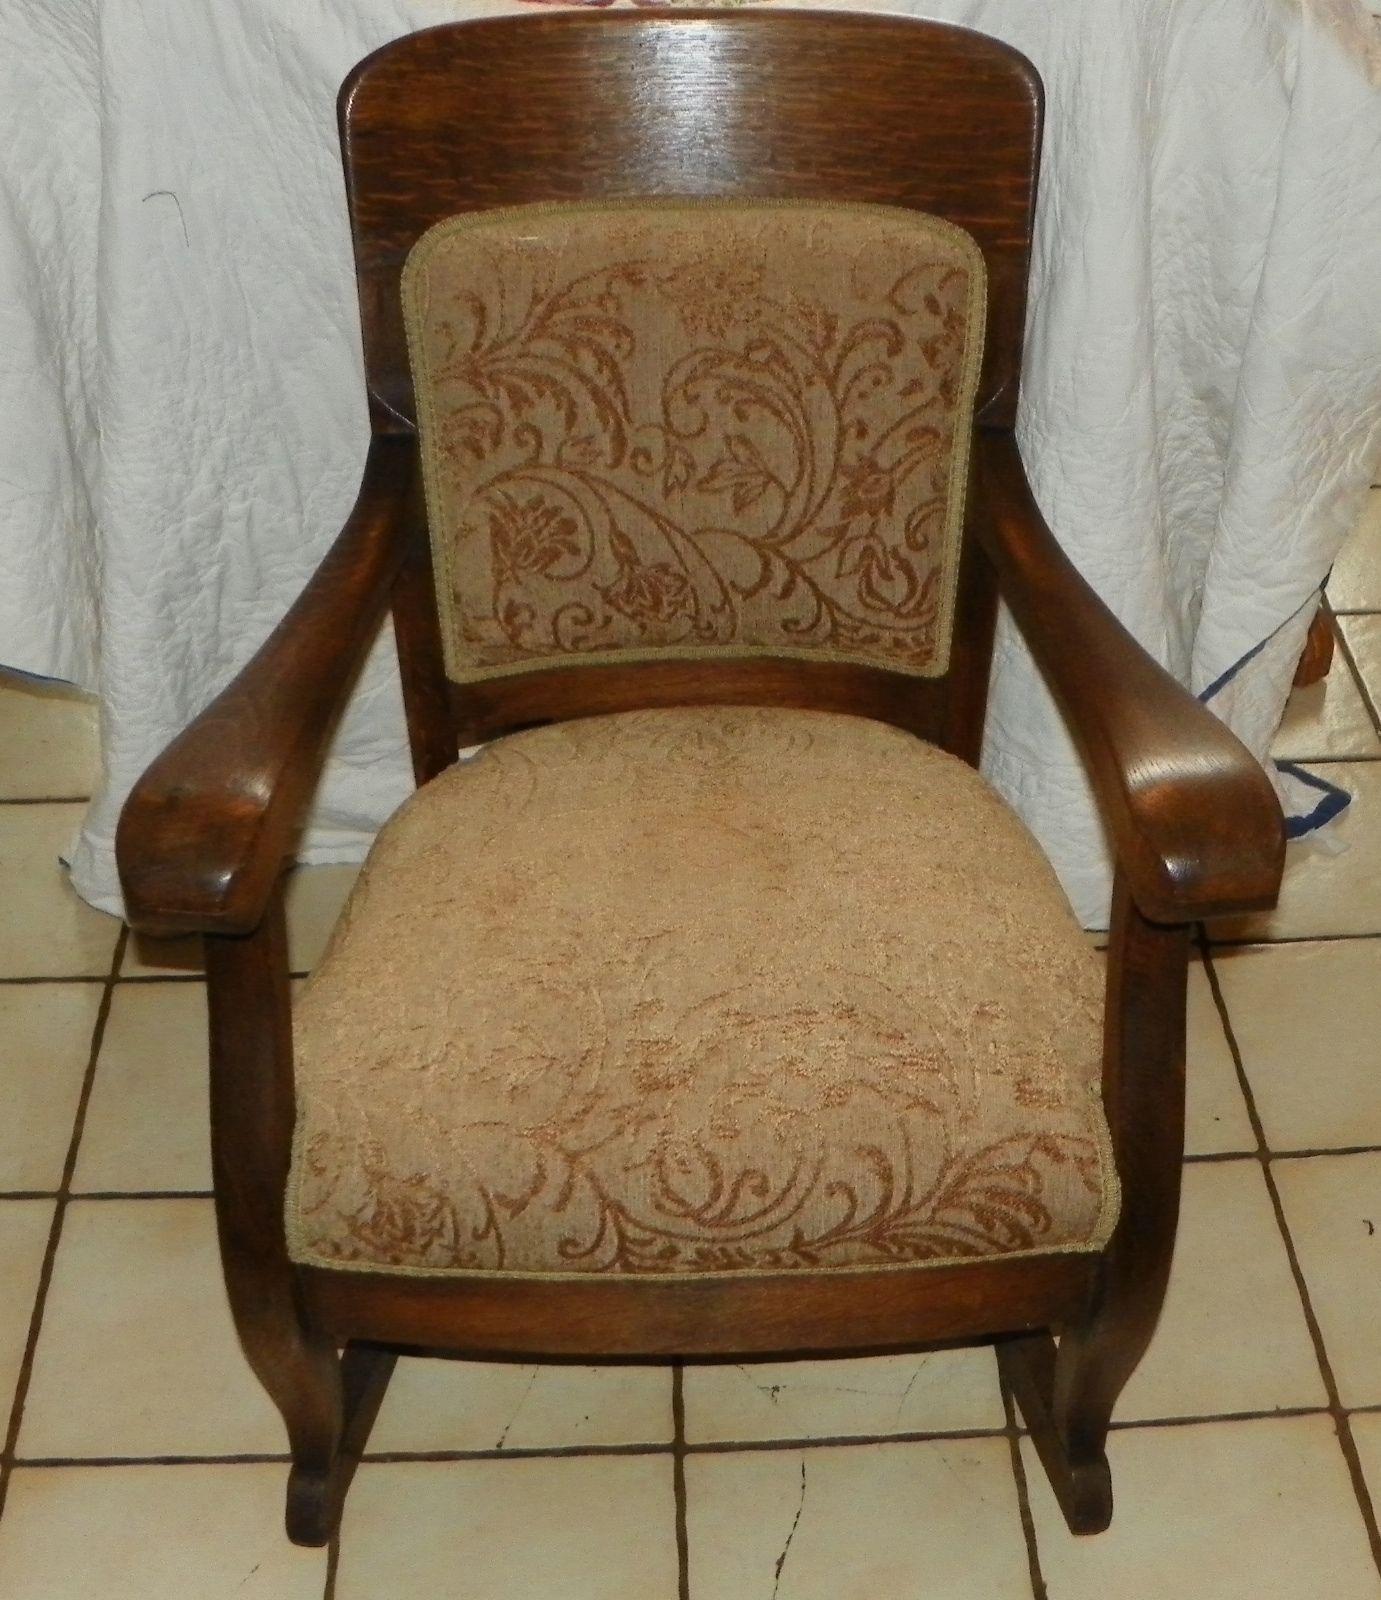 ... antiques » Quartersawn Oak Empire Rocker / Rocking Chair (R177